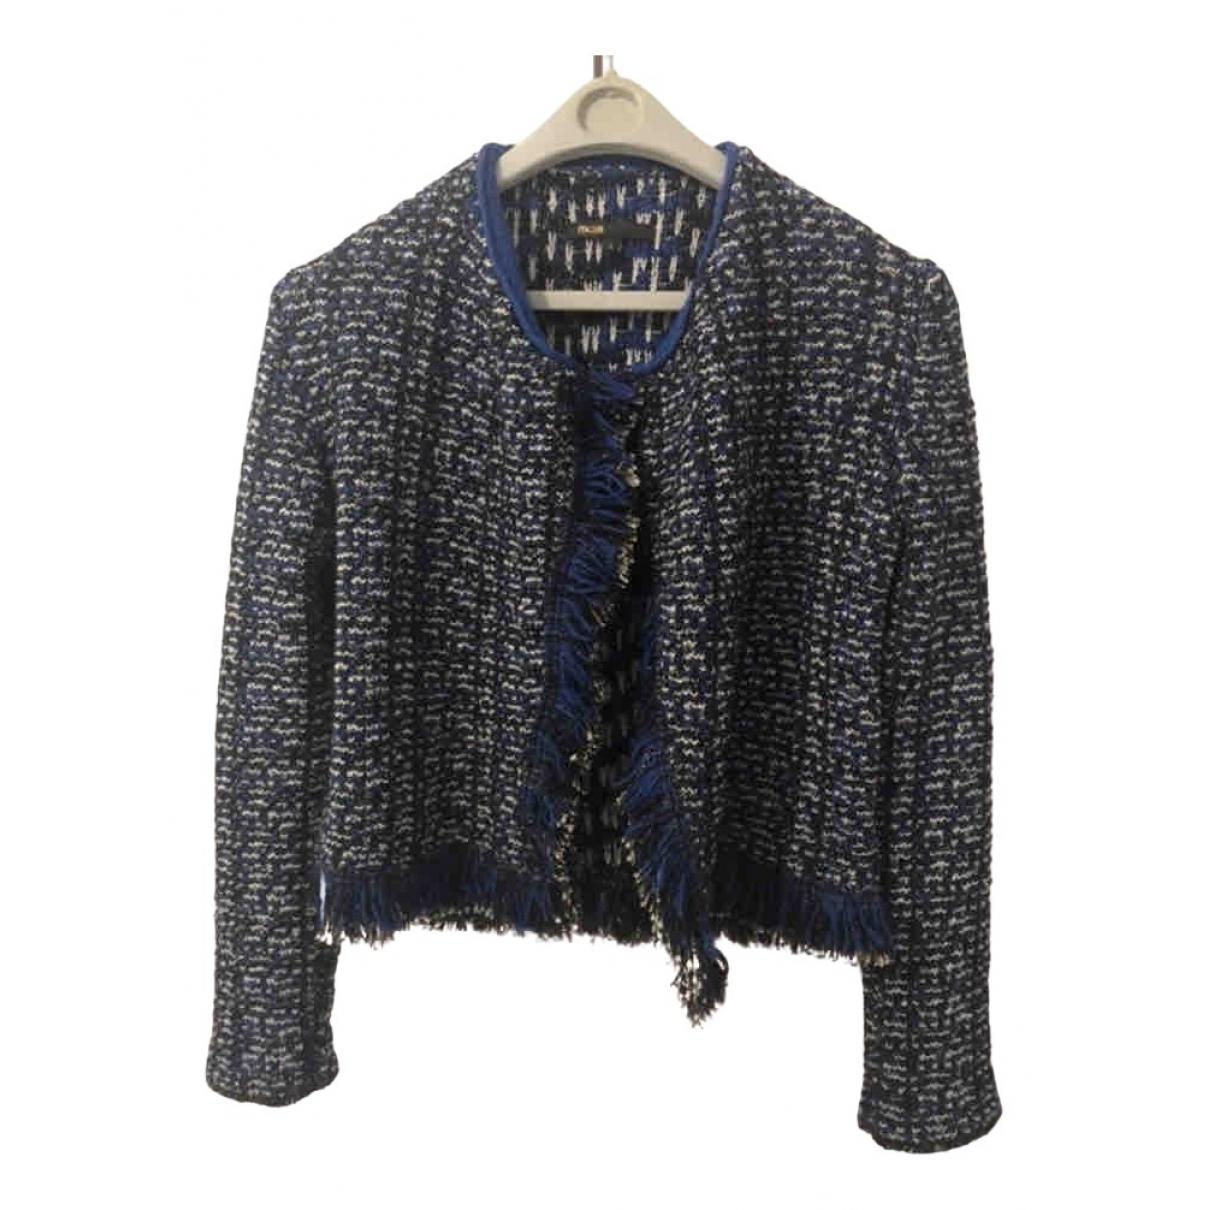 Maje N Blue Cotton jacket for Women 40 FR